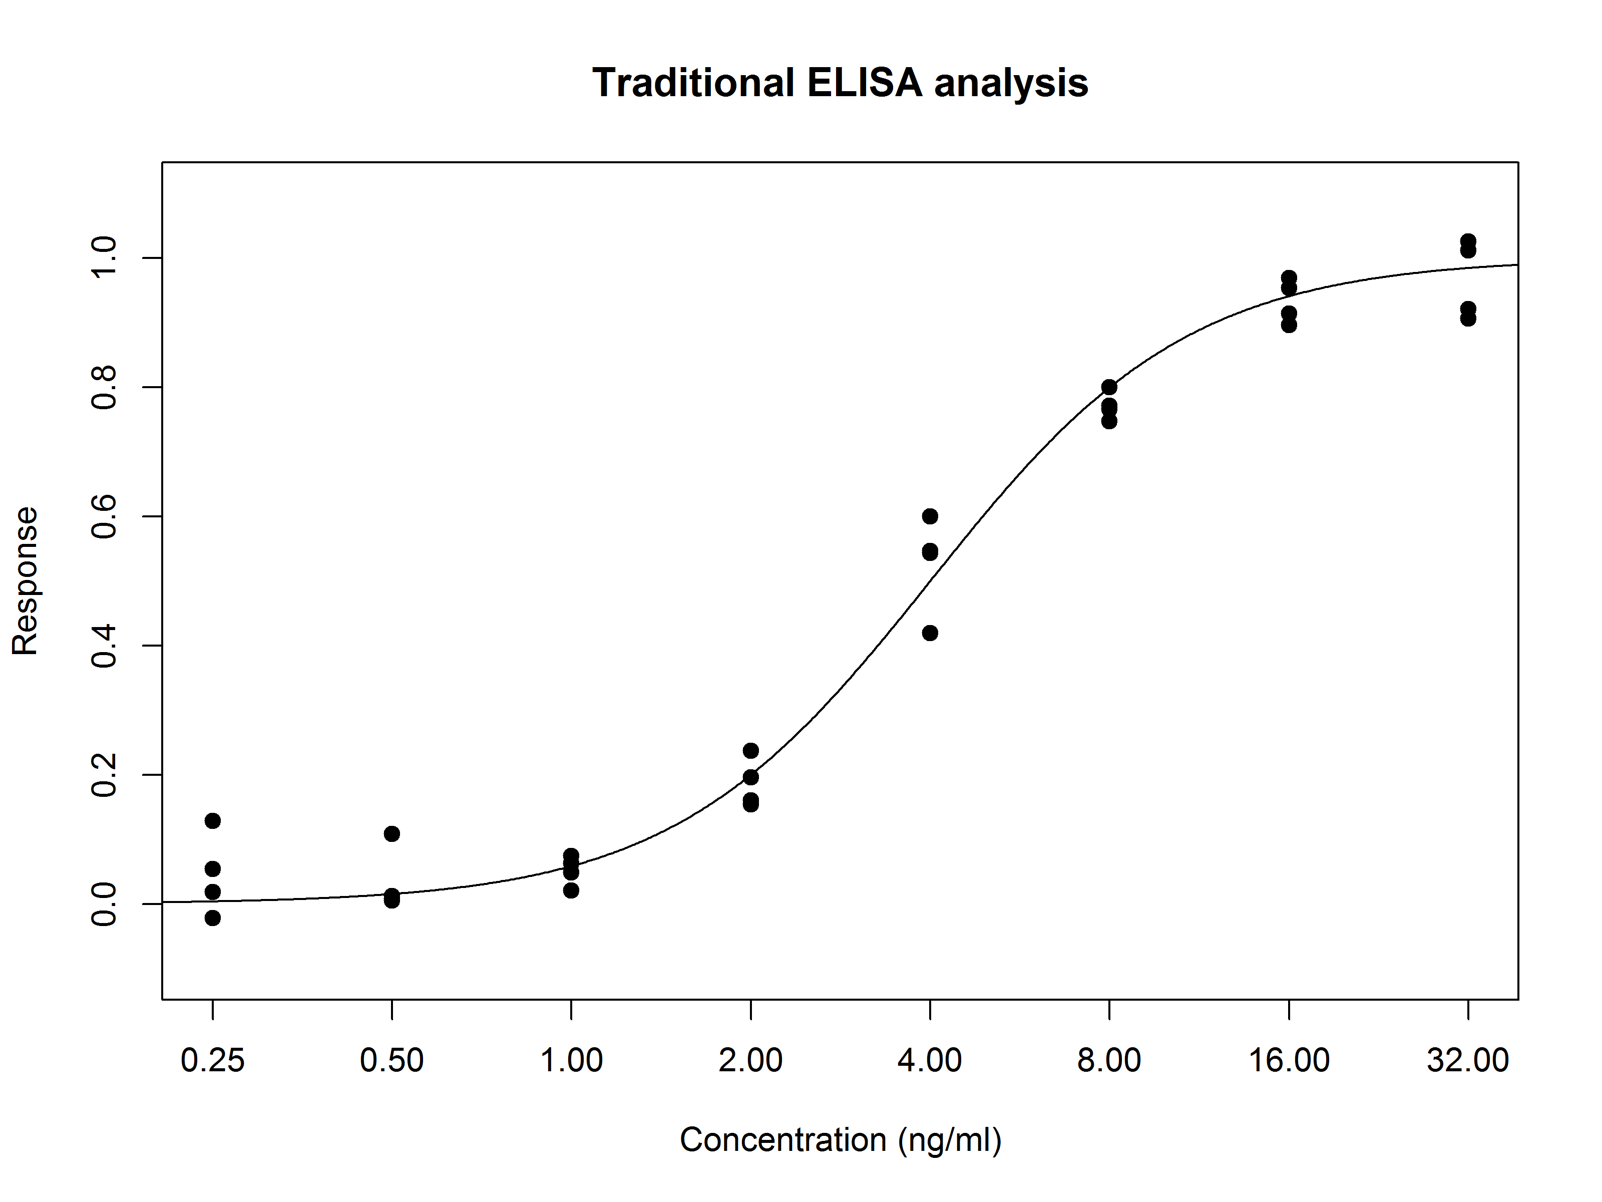 The standard Interpolation method for bioassay